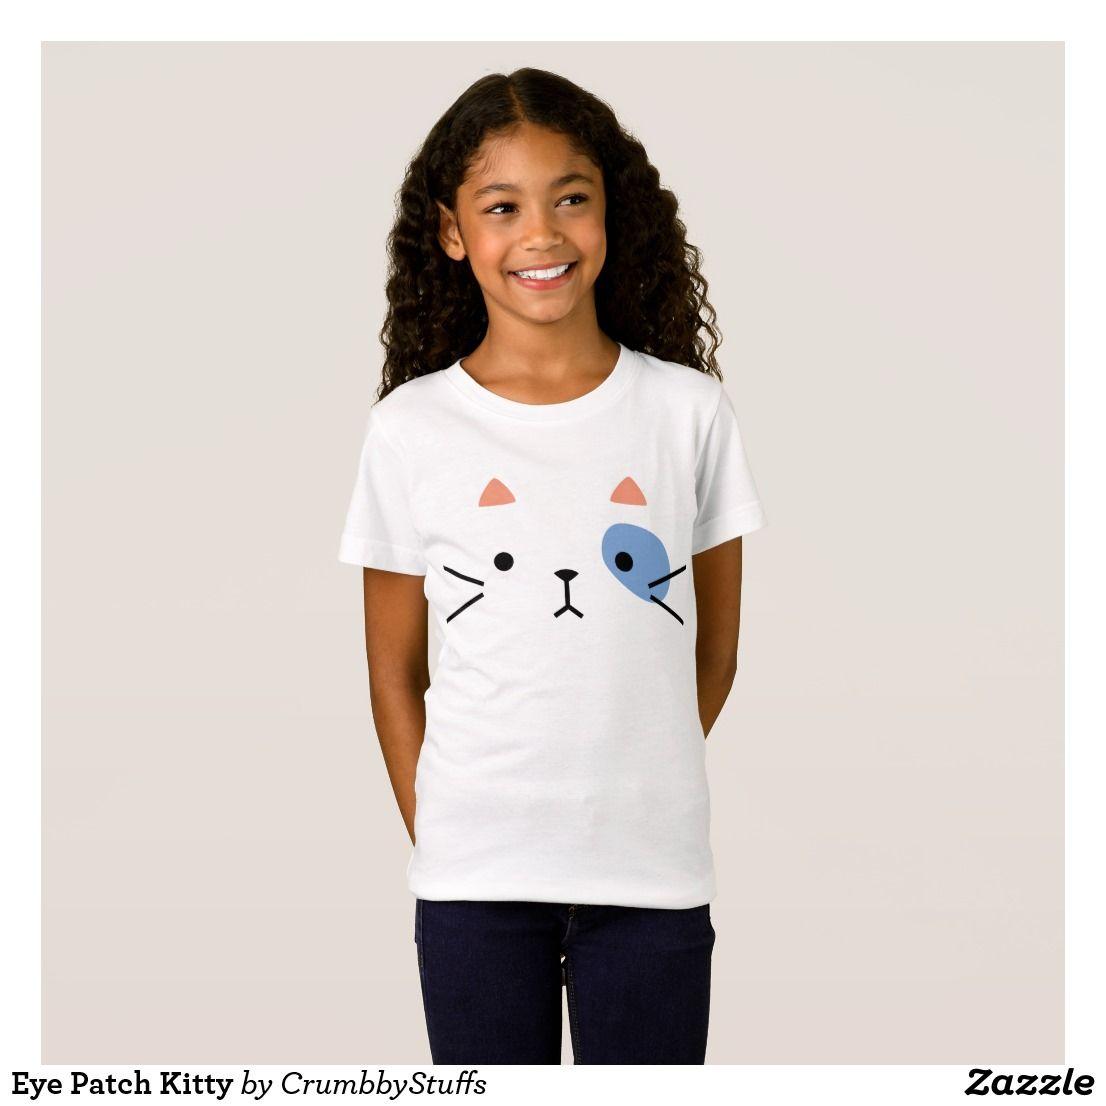 Eye Patch Kitty T-Shirt